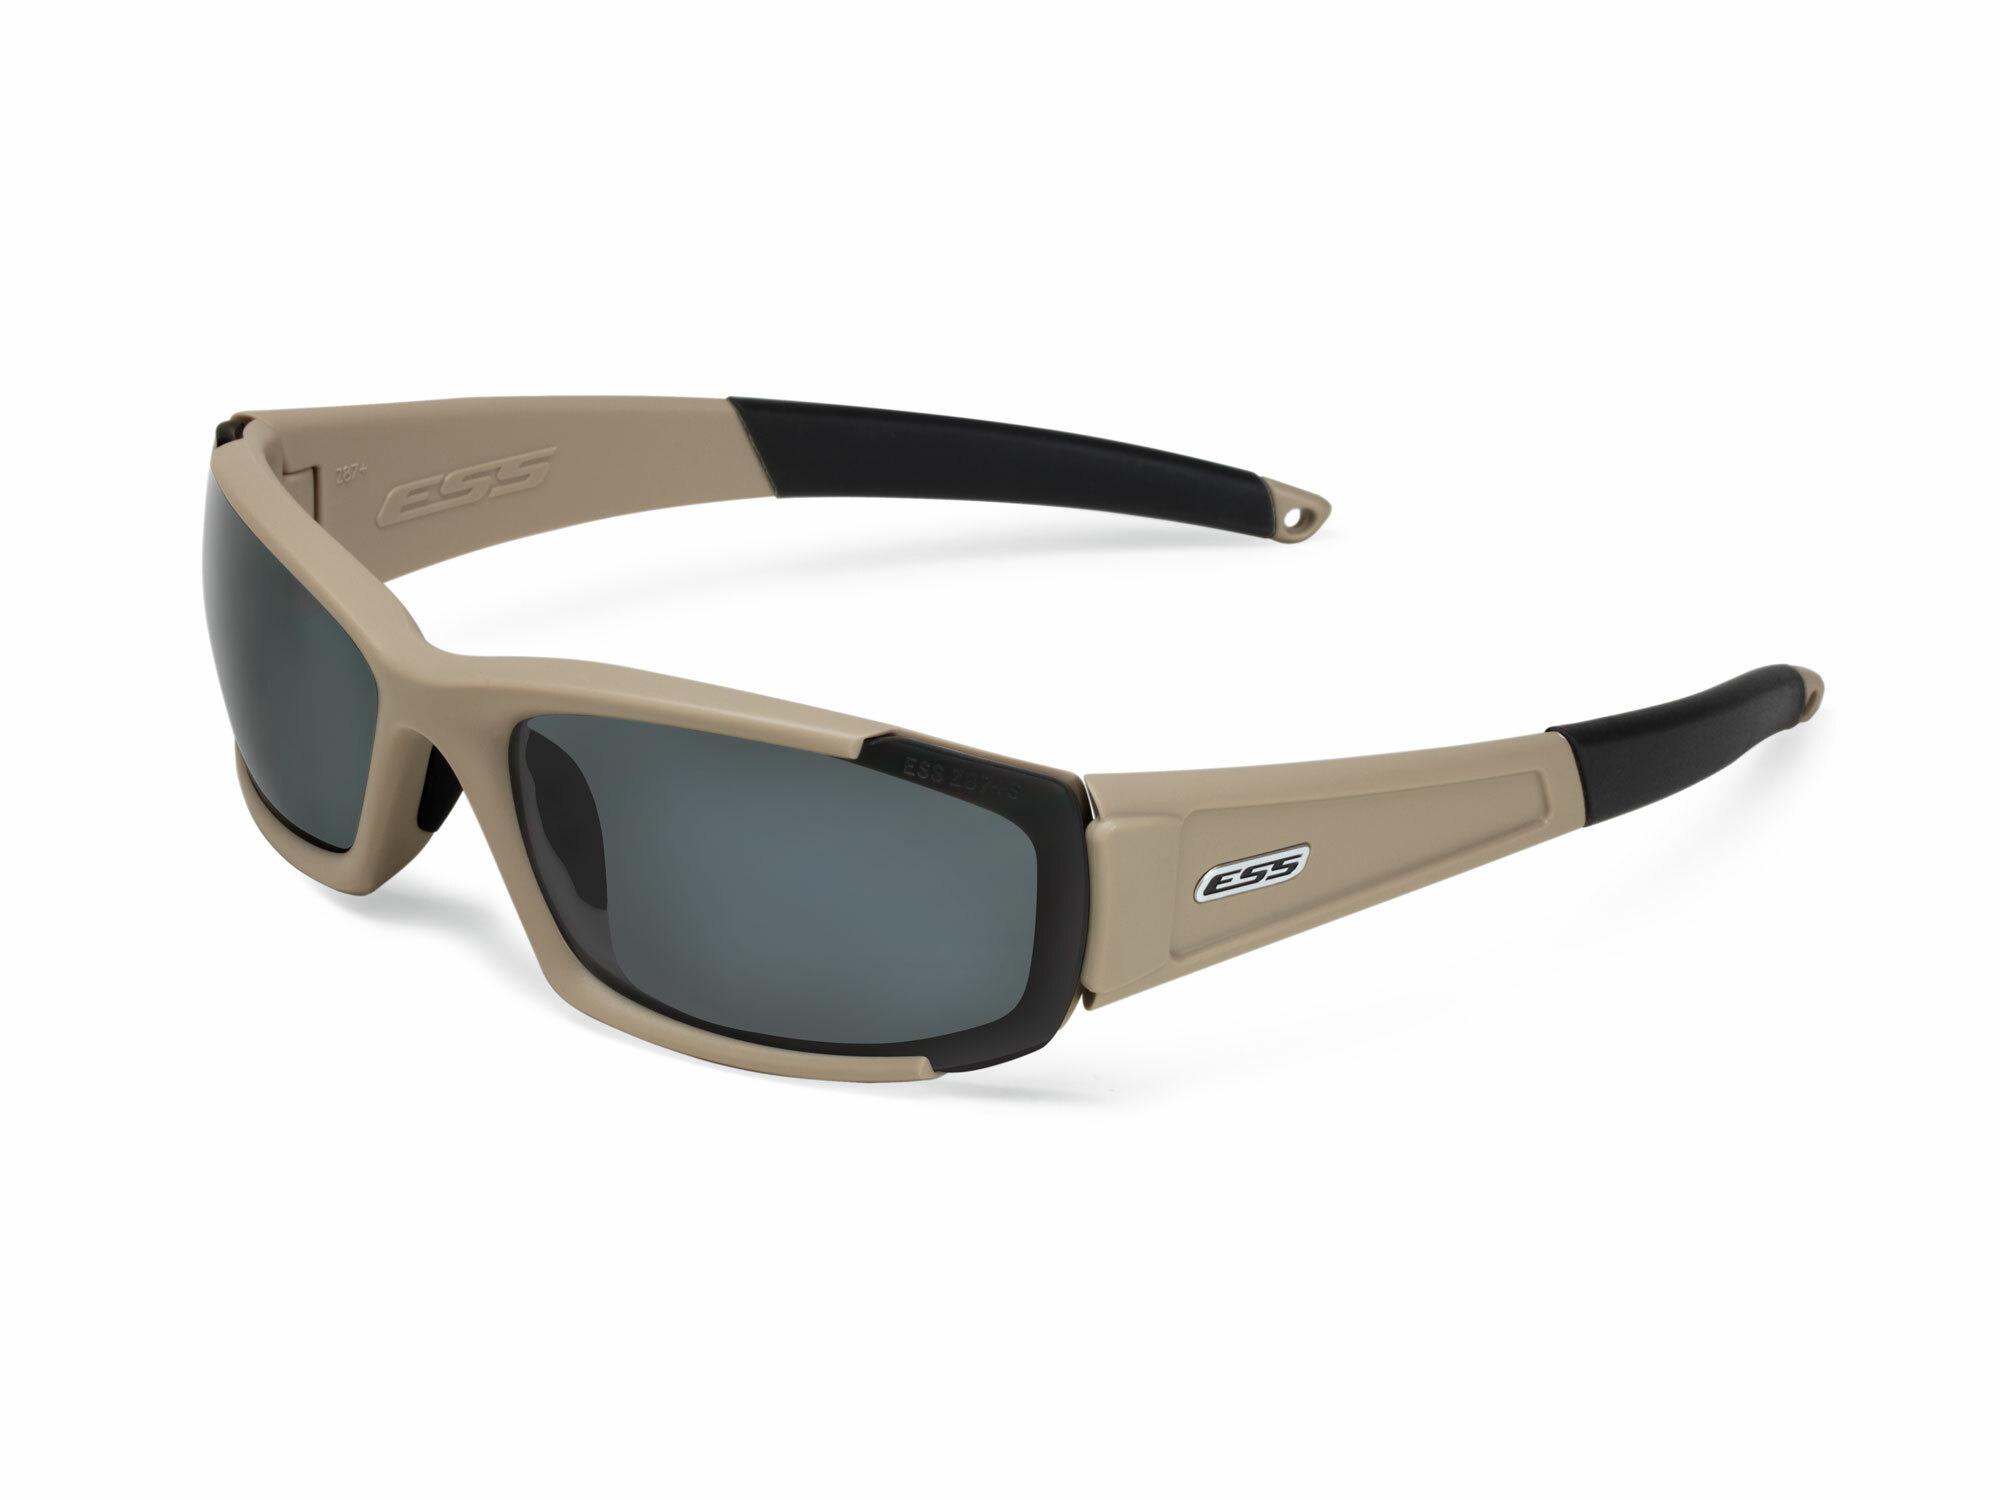 Repmart: ESS CDI sunglasses tongue 740-0458 タクティカル 740-0458 ...